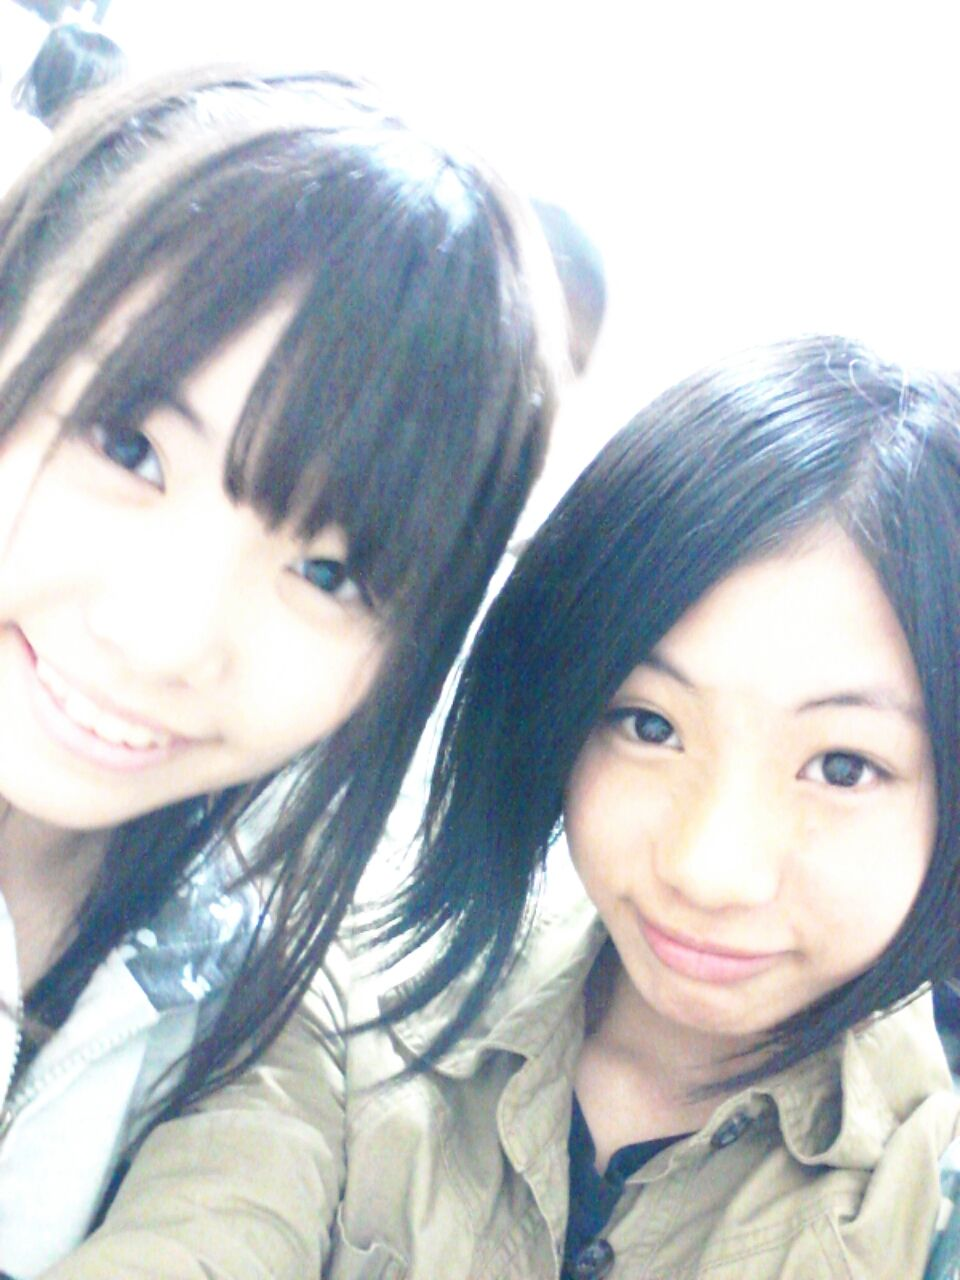 http://livedoor.blogimg.jp/otohaeika/imgs/2/1/210d342b.jpg